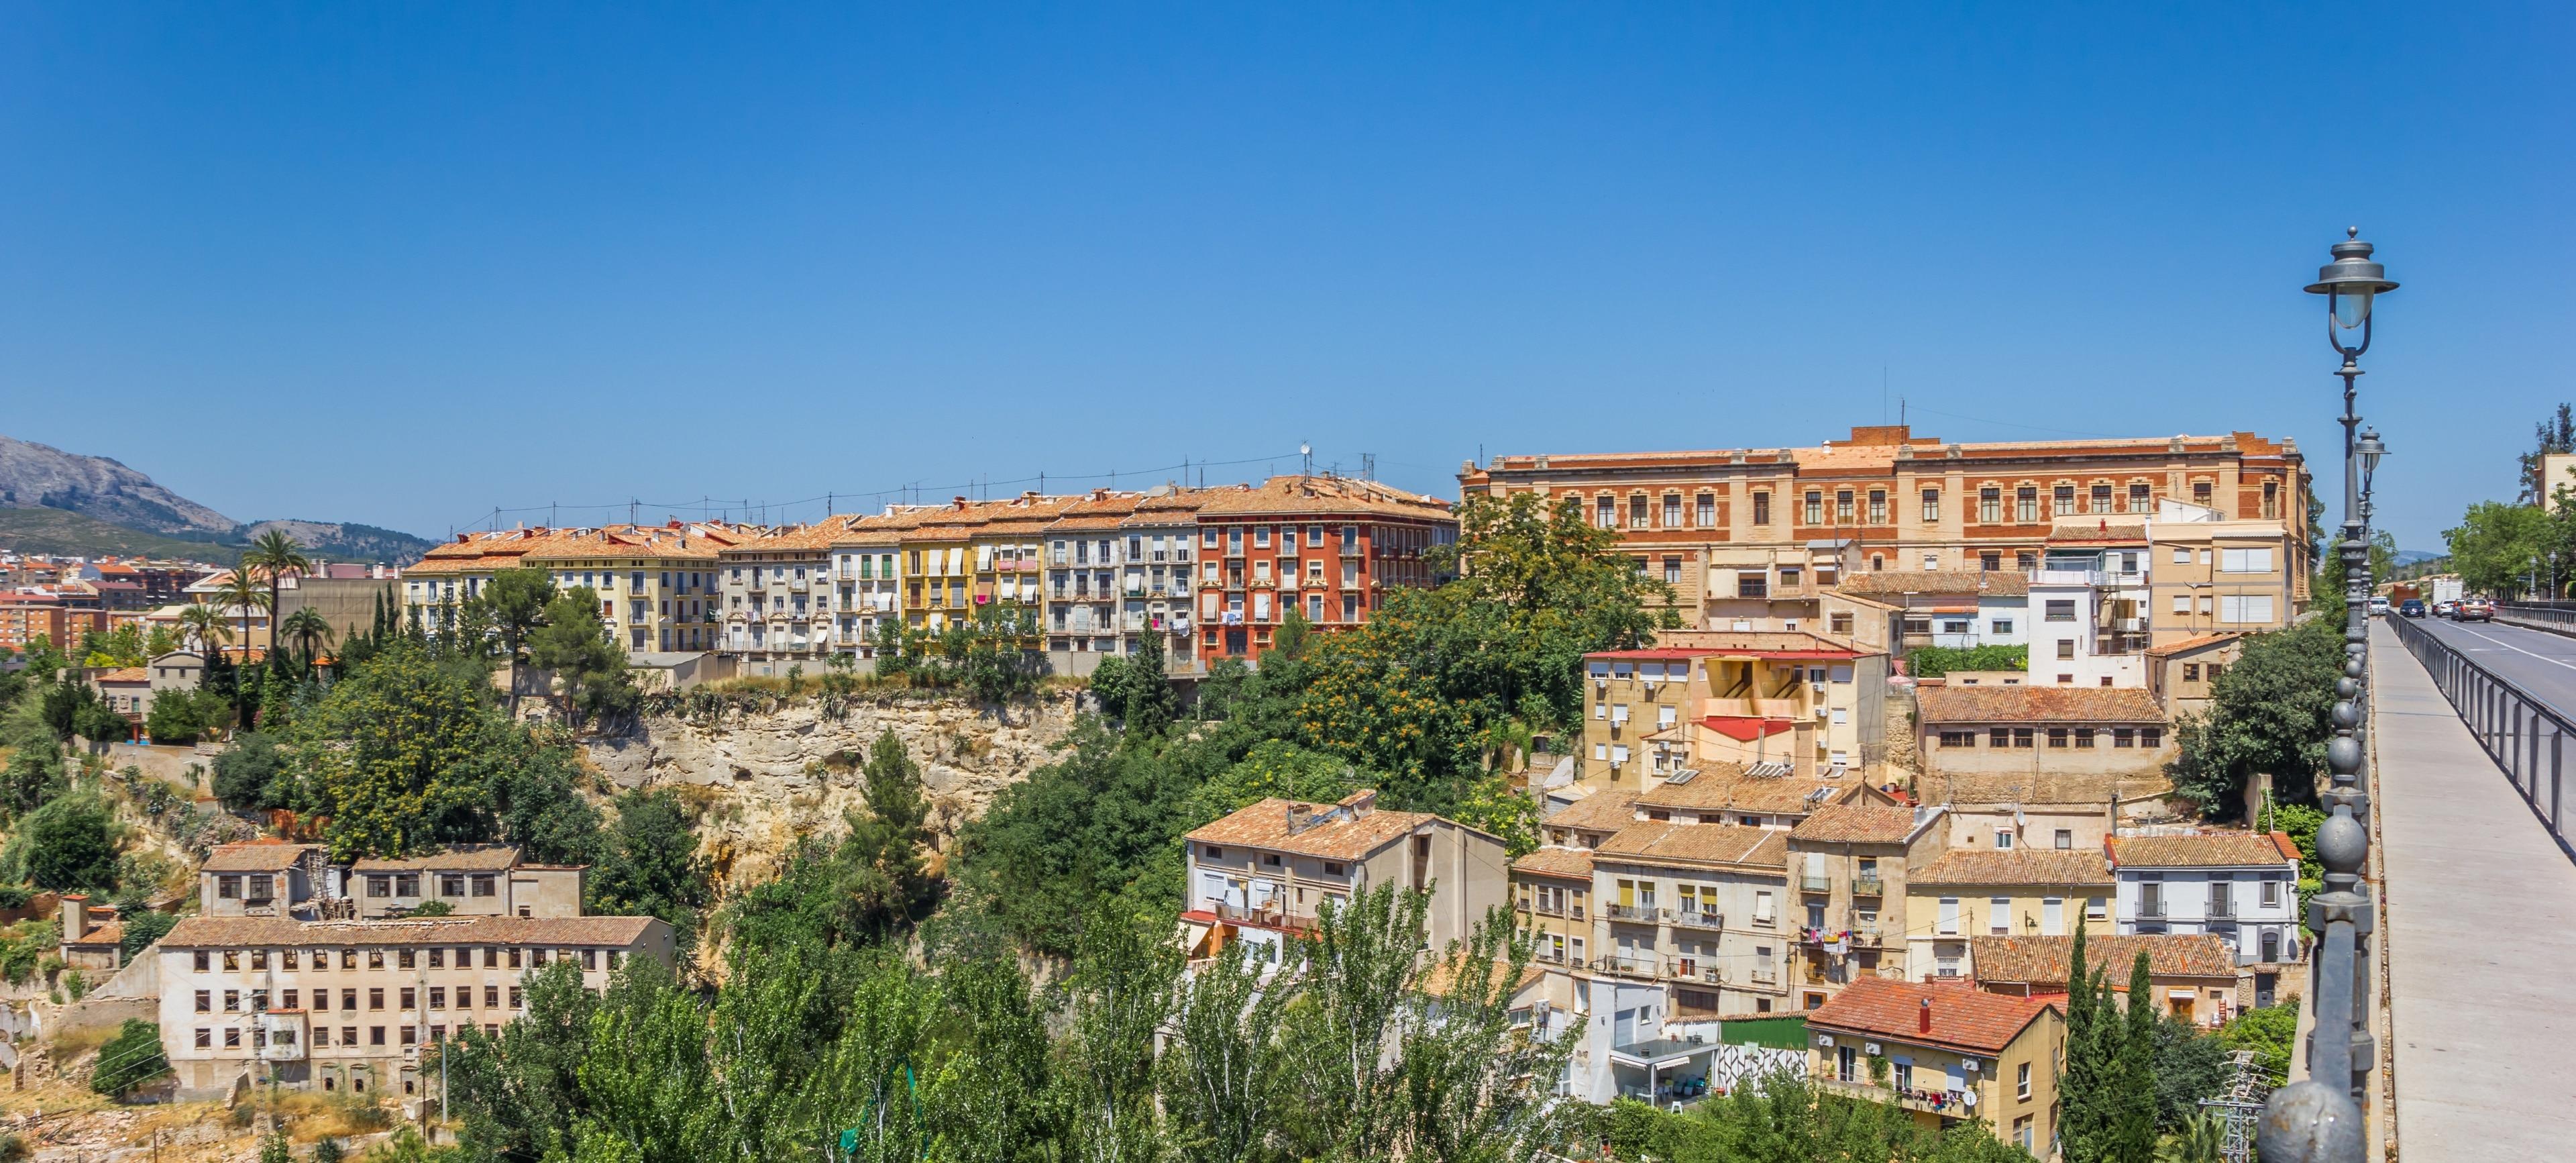 L'Alcoià, Valencianische Gemeinschaft, Spanien